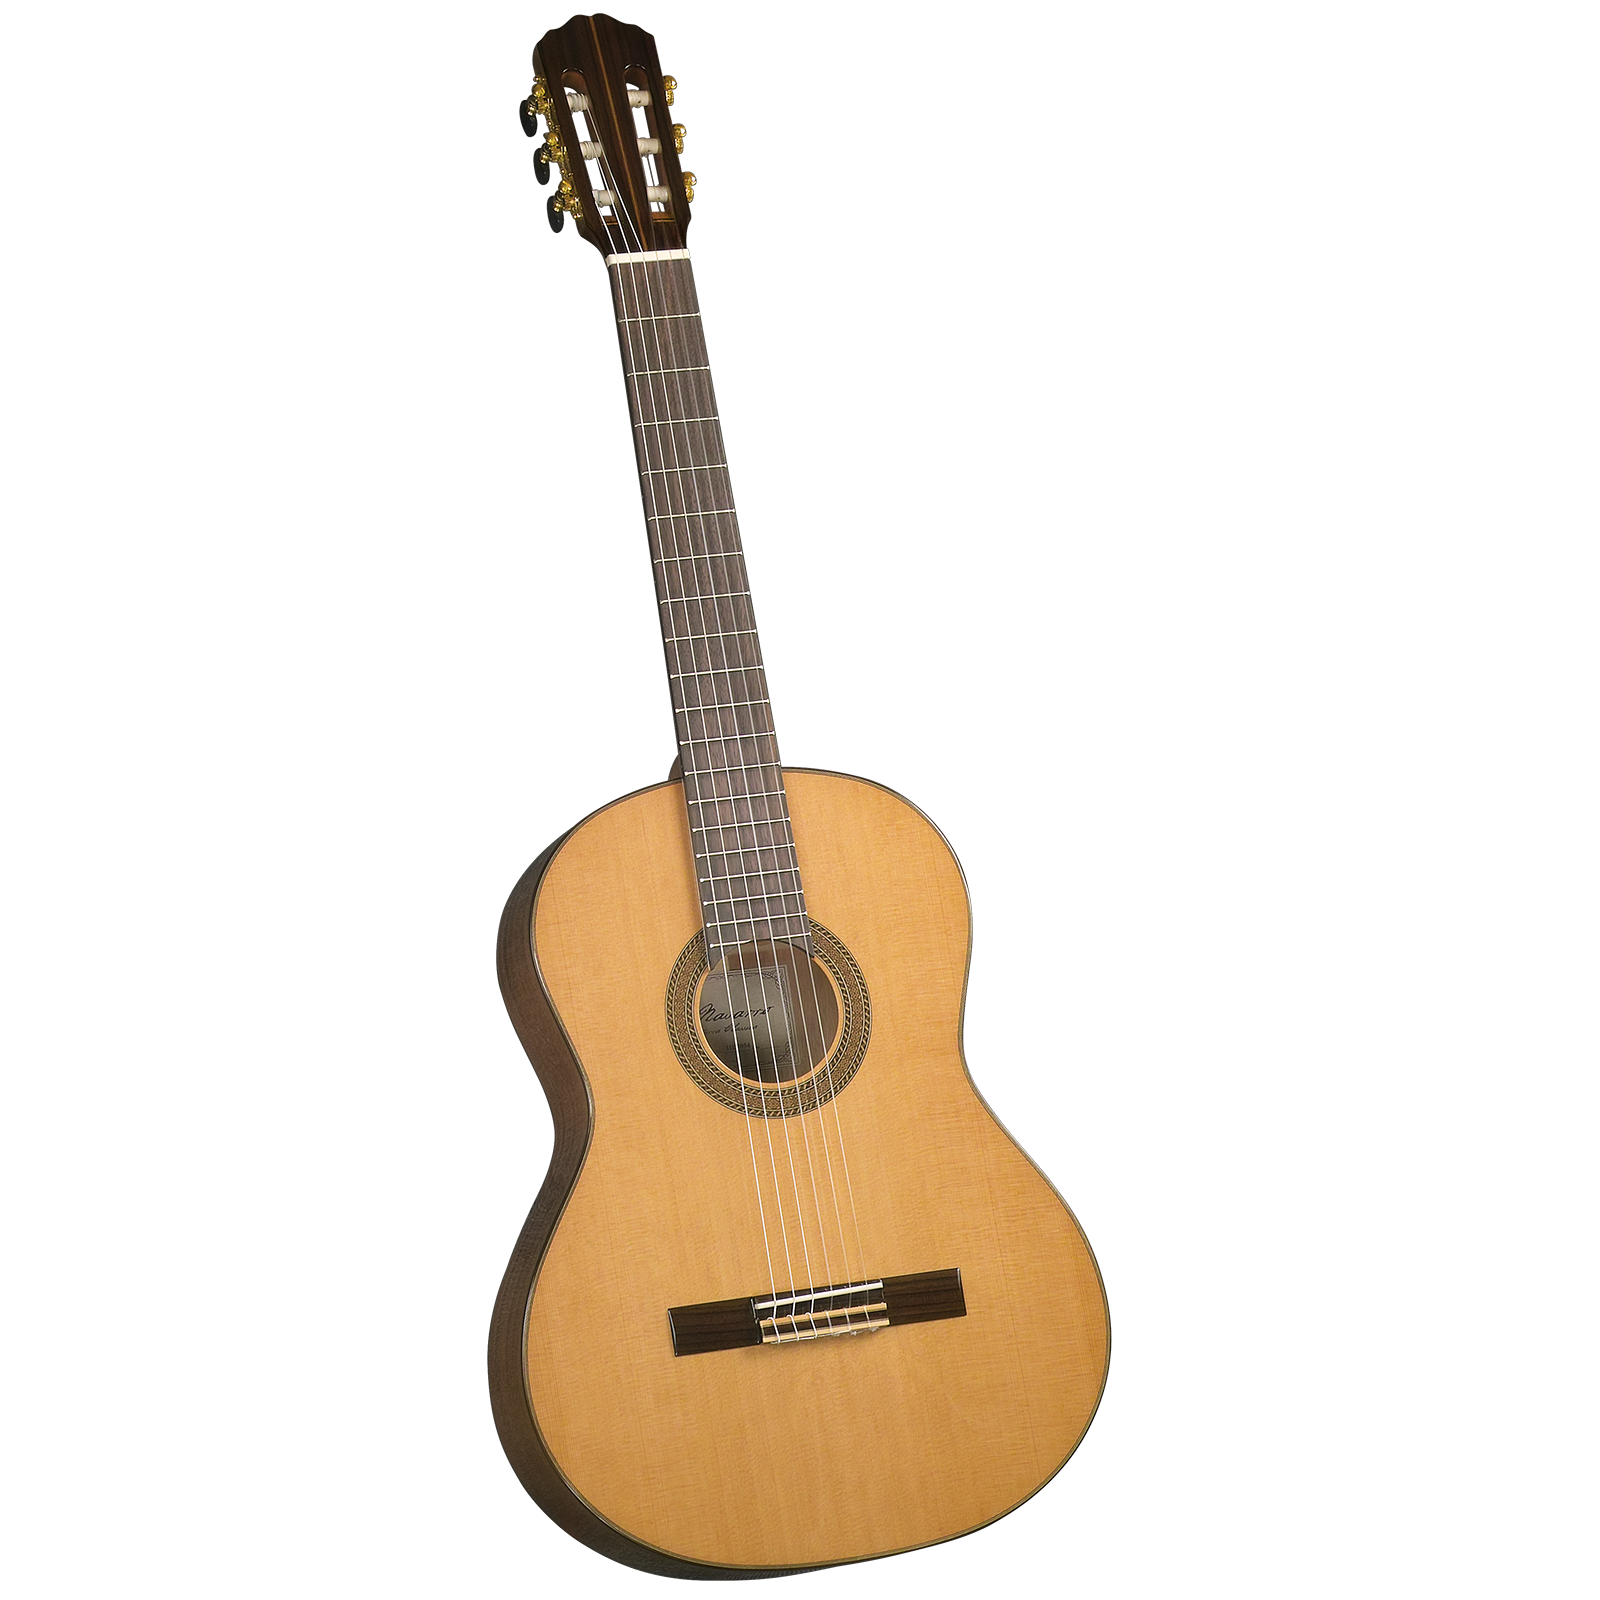 J. Navarro NC-41 Classical Guitar